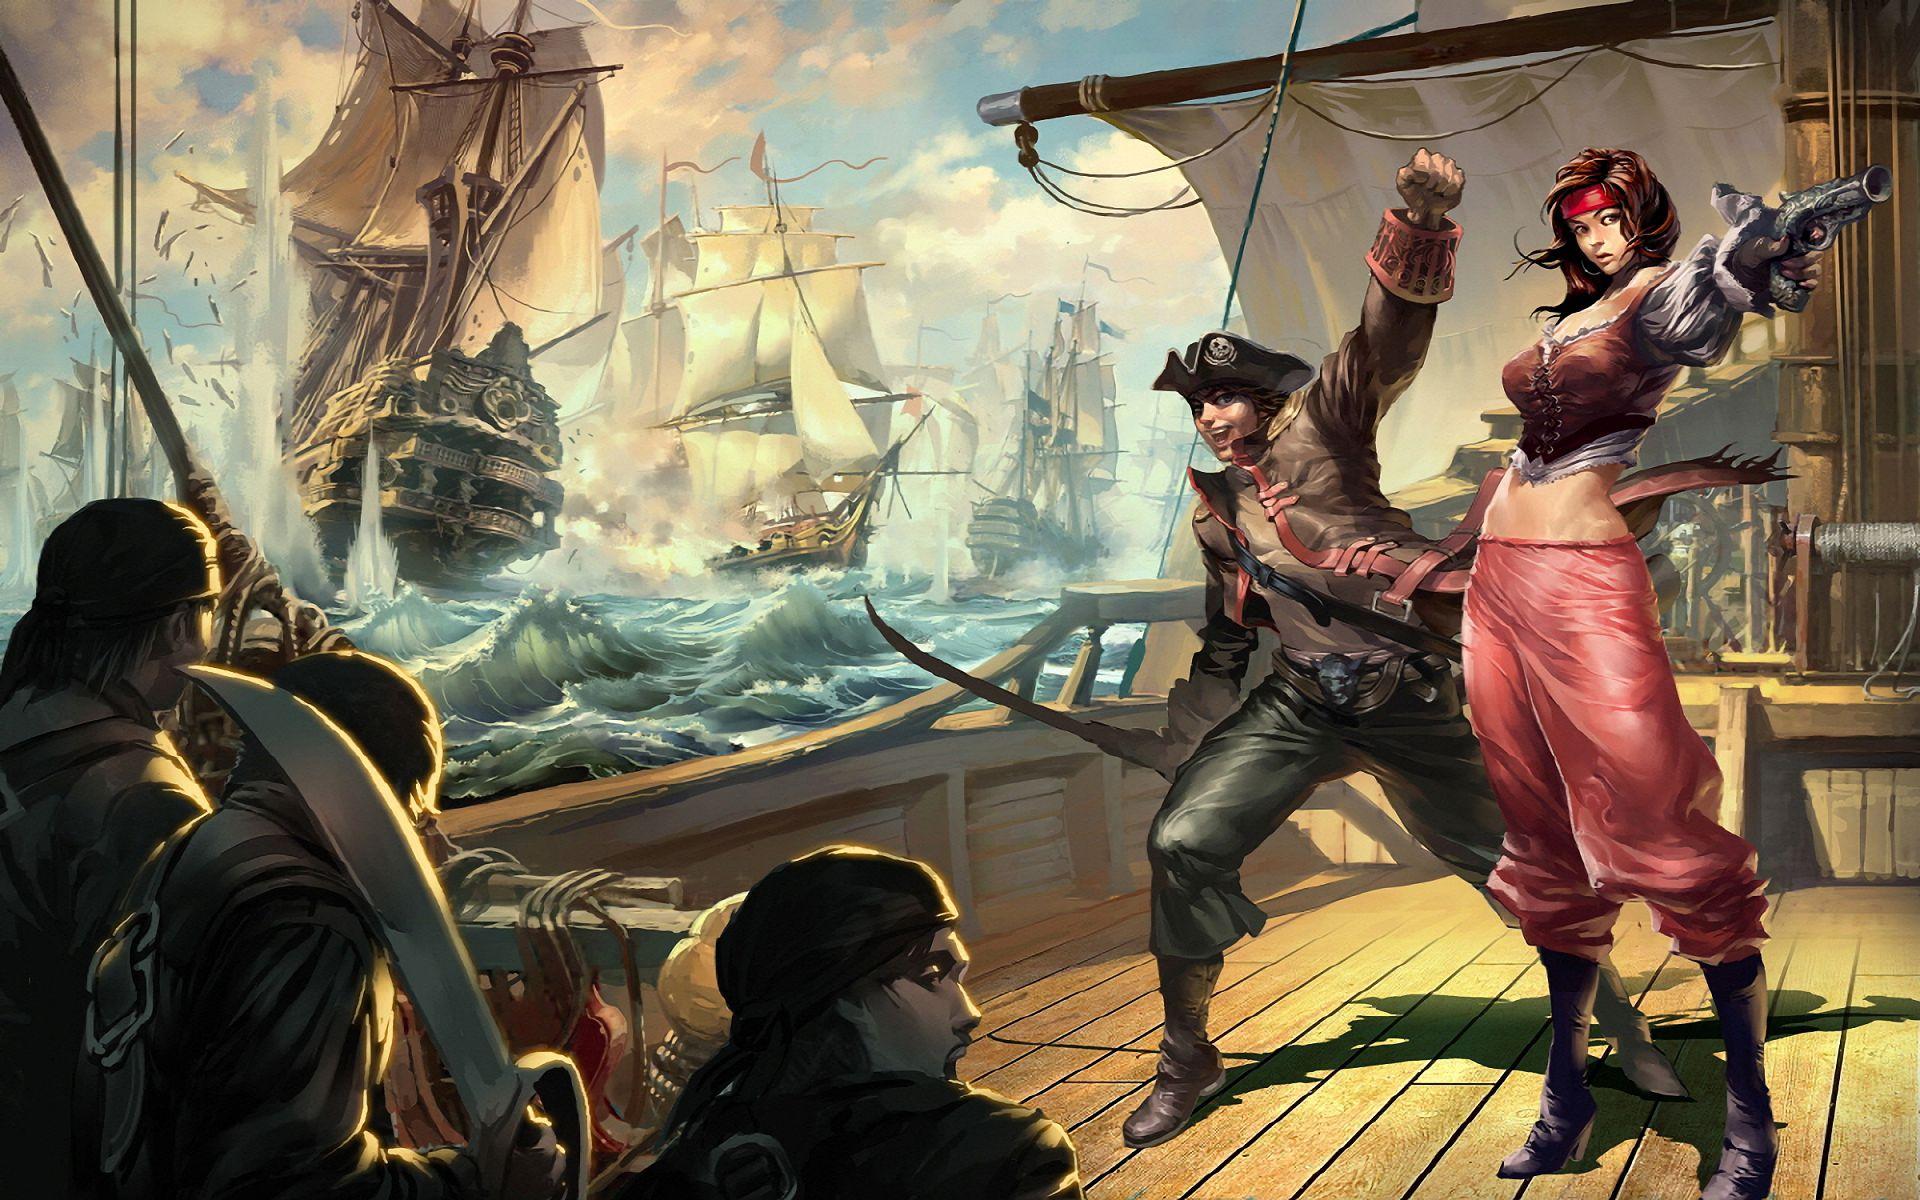 Fantasy ship cliff jolly roger pirate ship rock lightning wallpaper - Fantasy Pirate Wallpaper